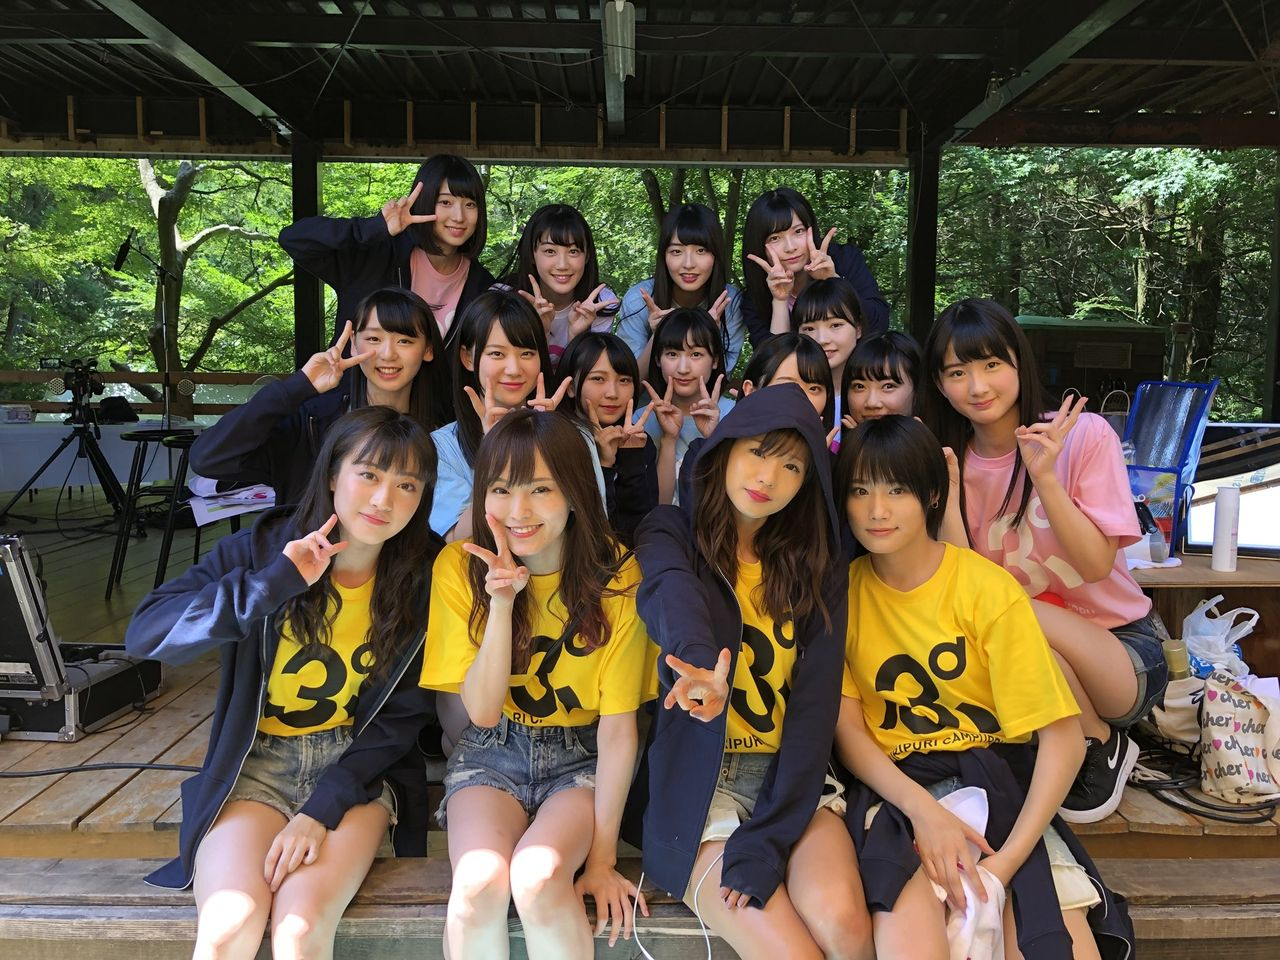 【NMB48】新YNN『キャンプっぷ』カレー作り さや姉の名言キタ━━━━(゚∀゚)━━━━!!実況